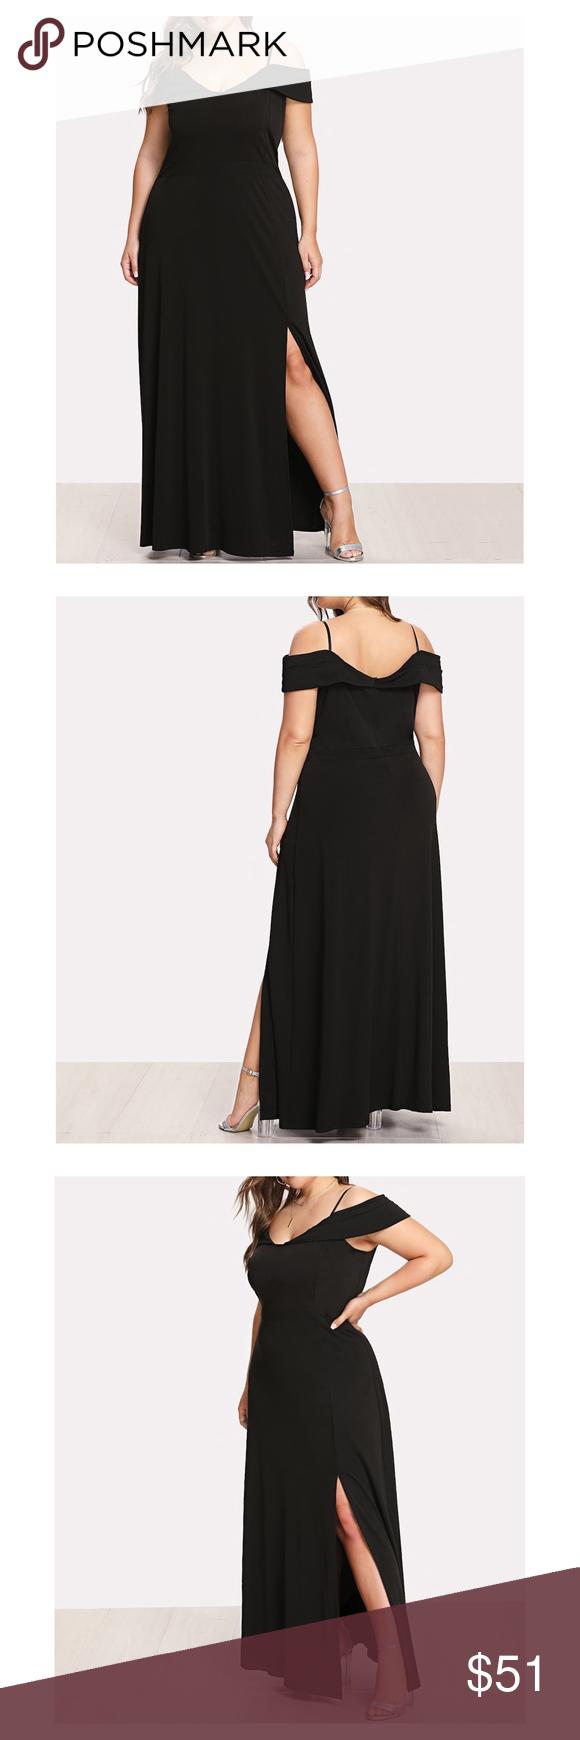 Photo of Black Cap Sleeve Side Slit Plus Size Maxi Dress V Neckline Spaghe